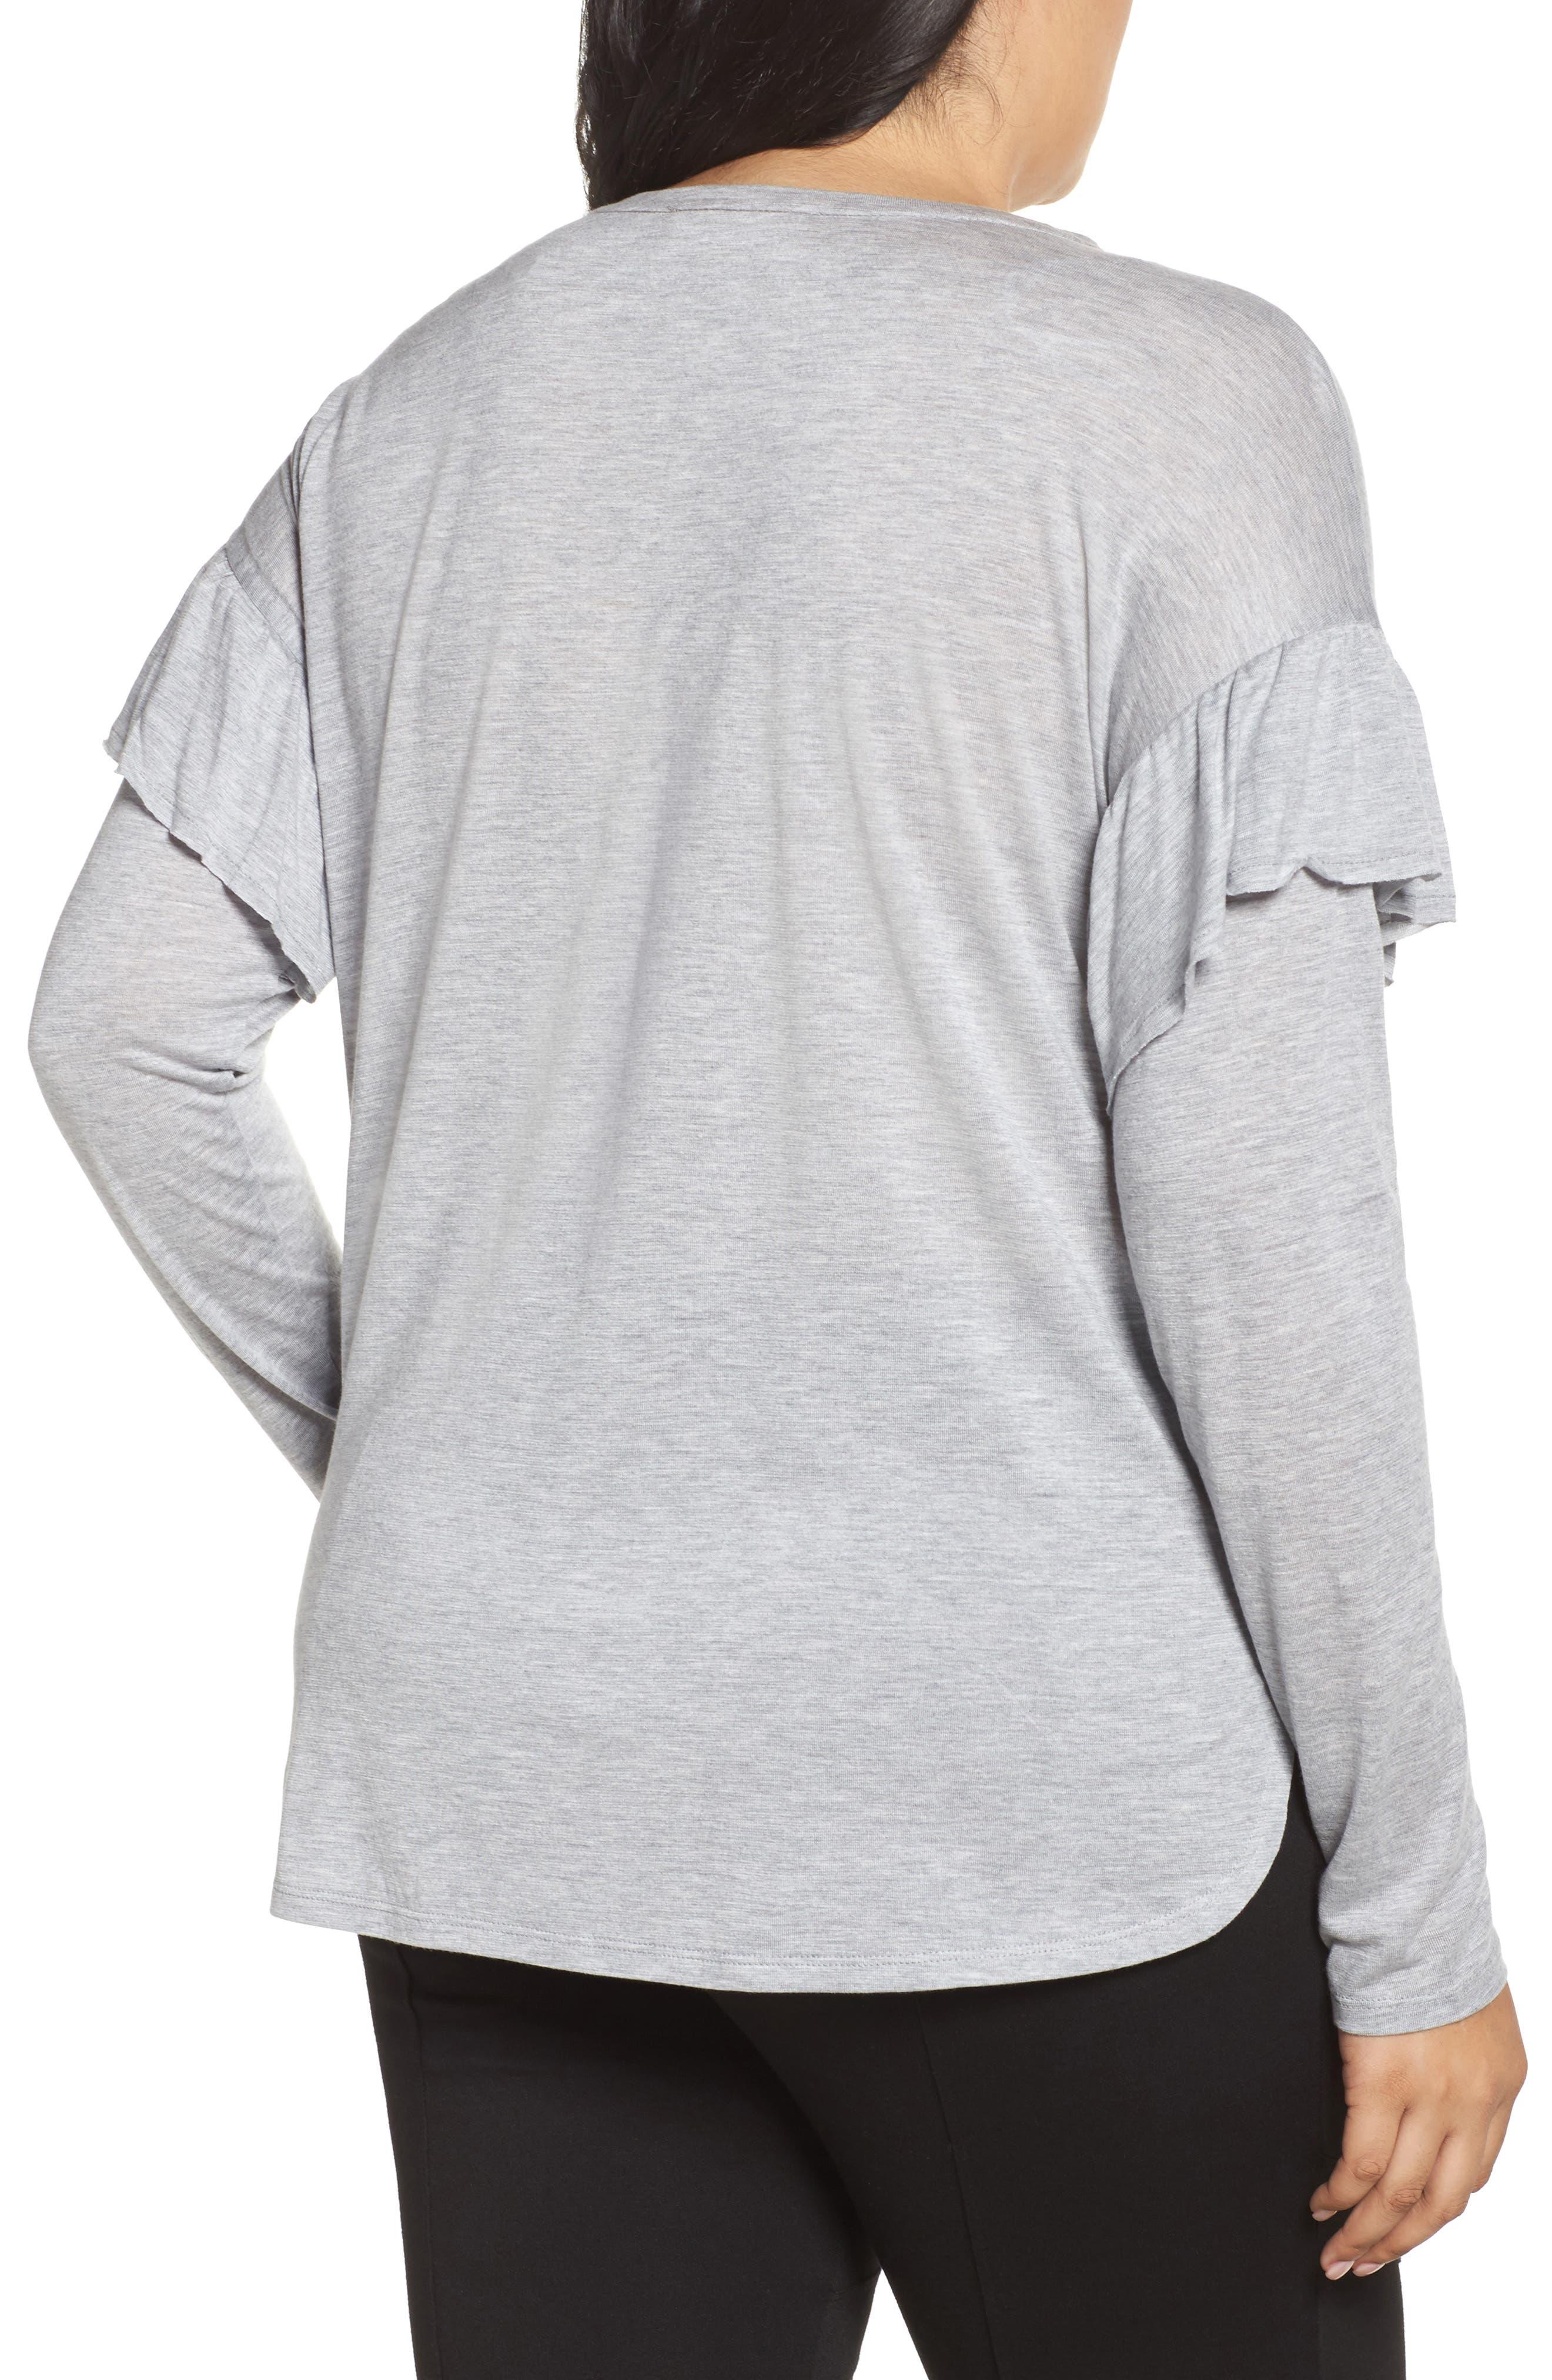 Long Sleeve Ruffle Shoulder Top,                             Alternate thumbnail 2, color,                             Light Heather Grey